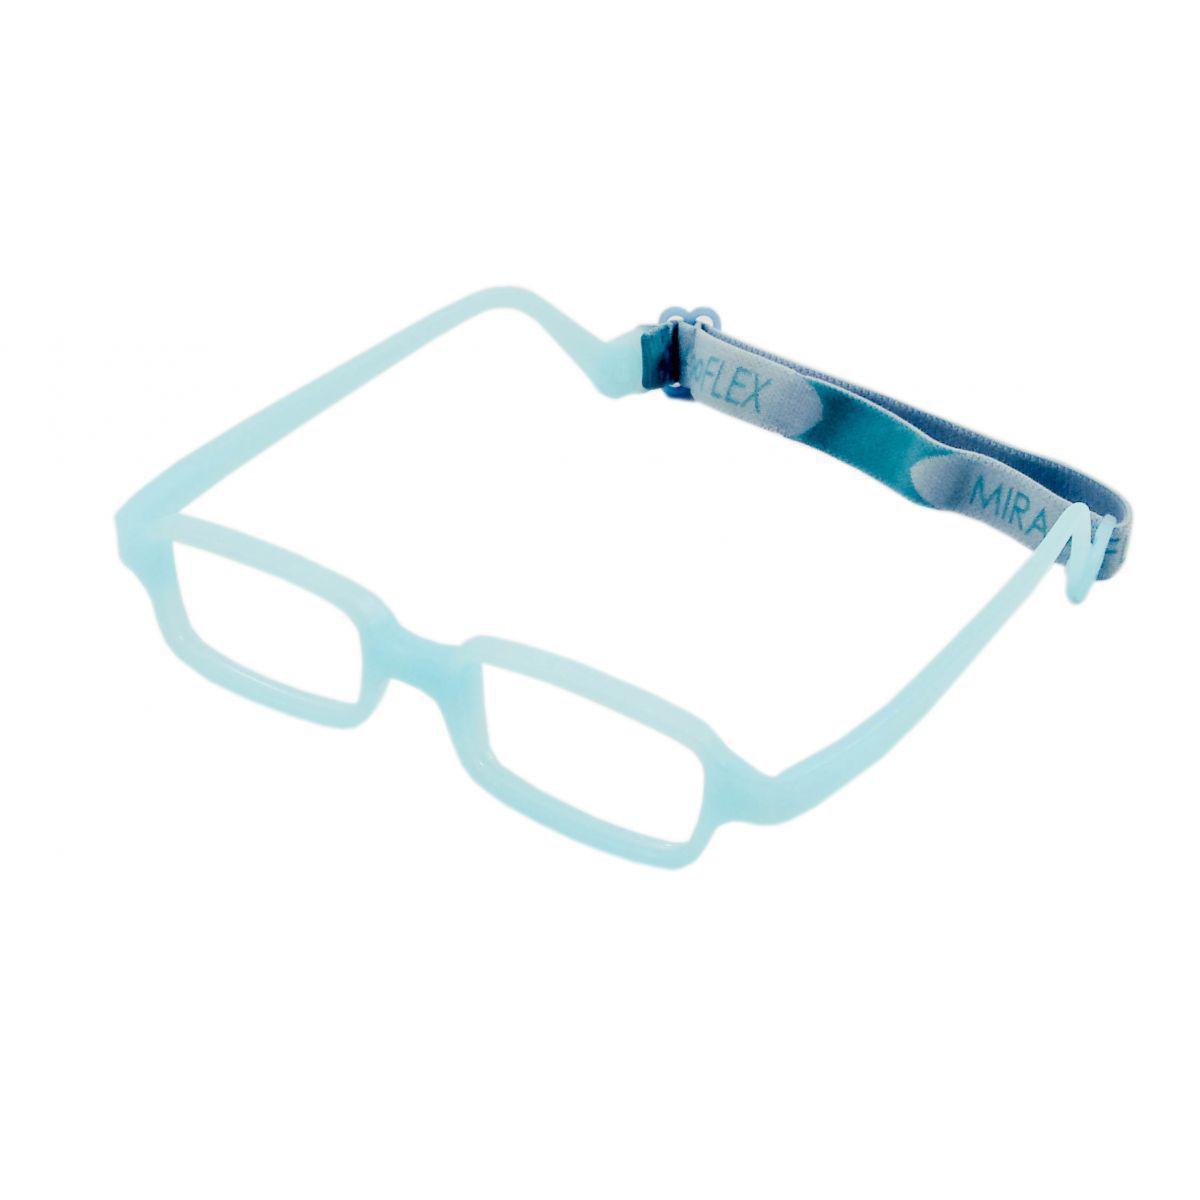 122f6ea52 Óculos De Grau Infantil Miraflex Silicone 3 a 6 Anos New Baby 1 Tam.39 -  Miraflex original R$ 389,00 à vista. Adicionar à sacola